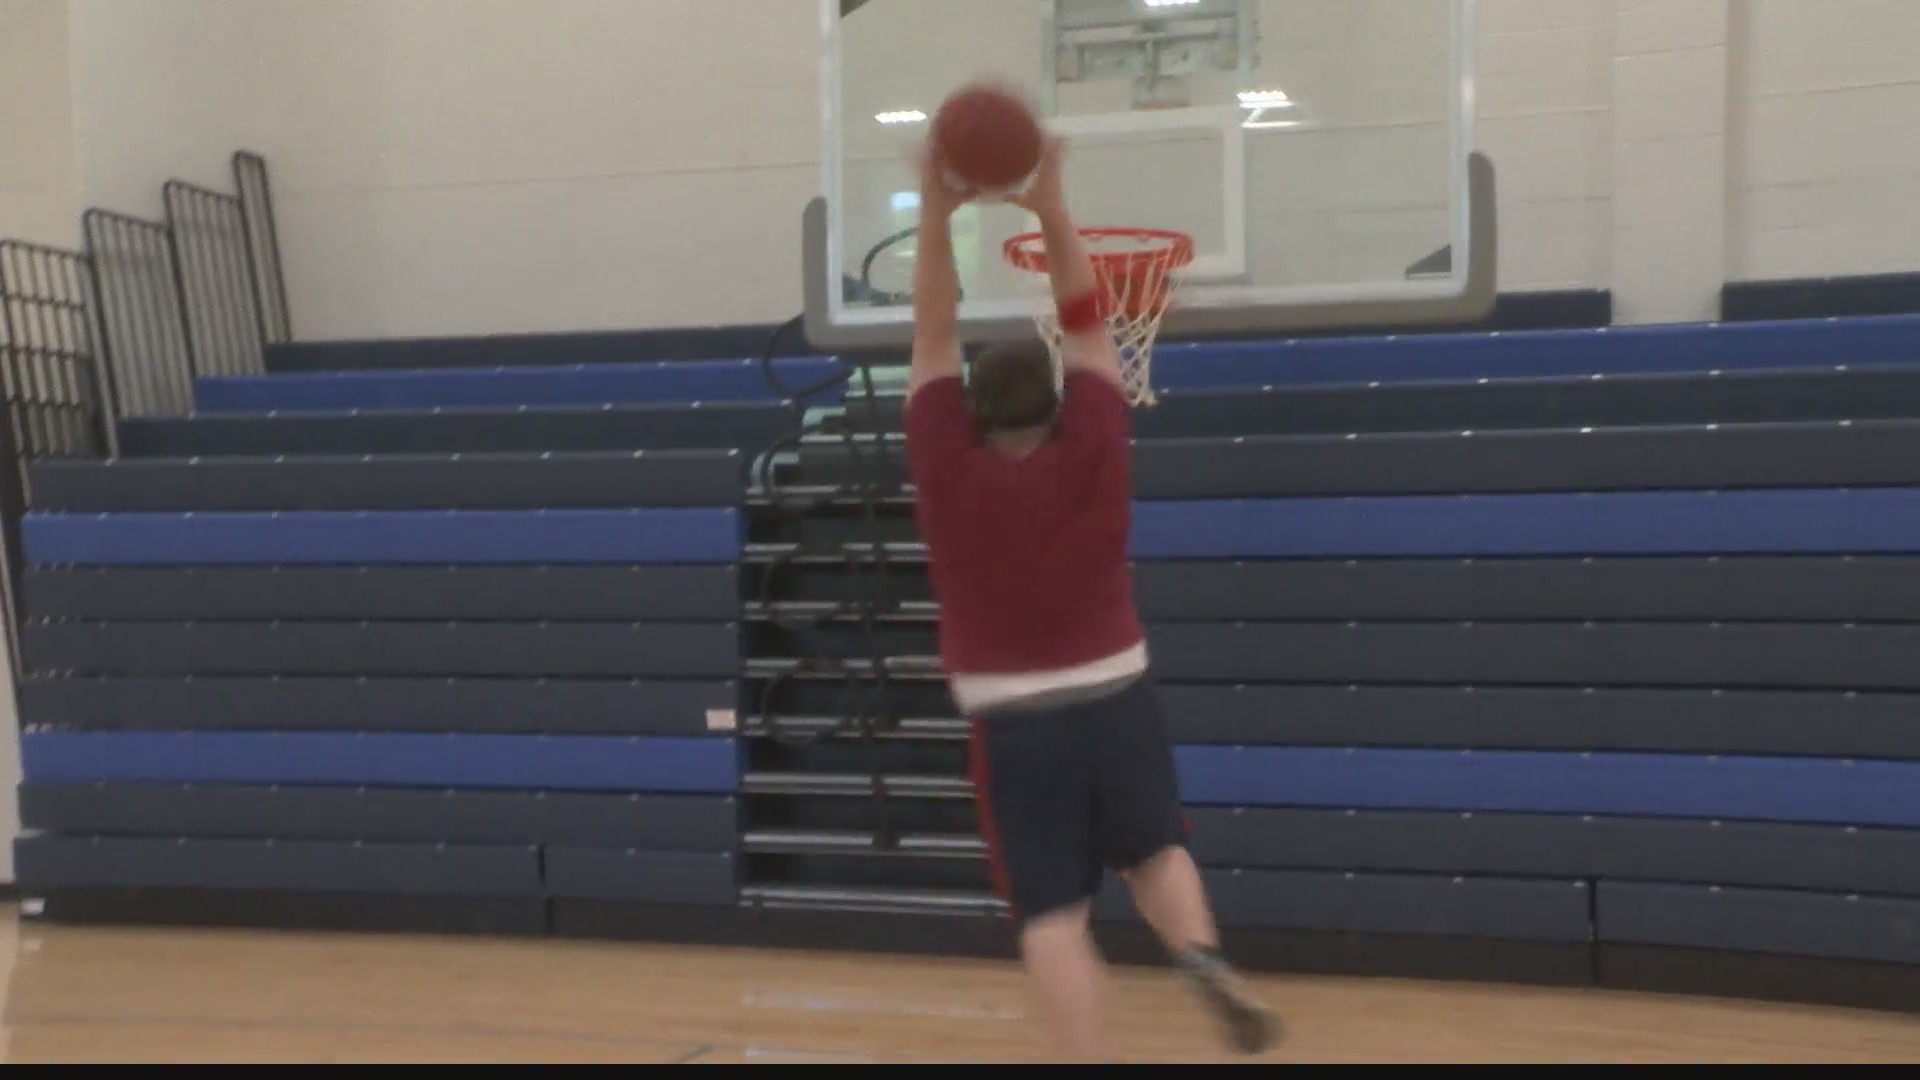 PSU Altoona Dunk Contest: Jordan vs K.C.